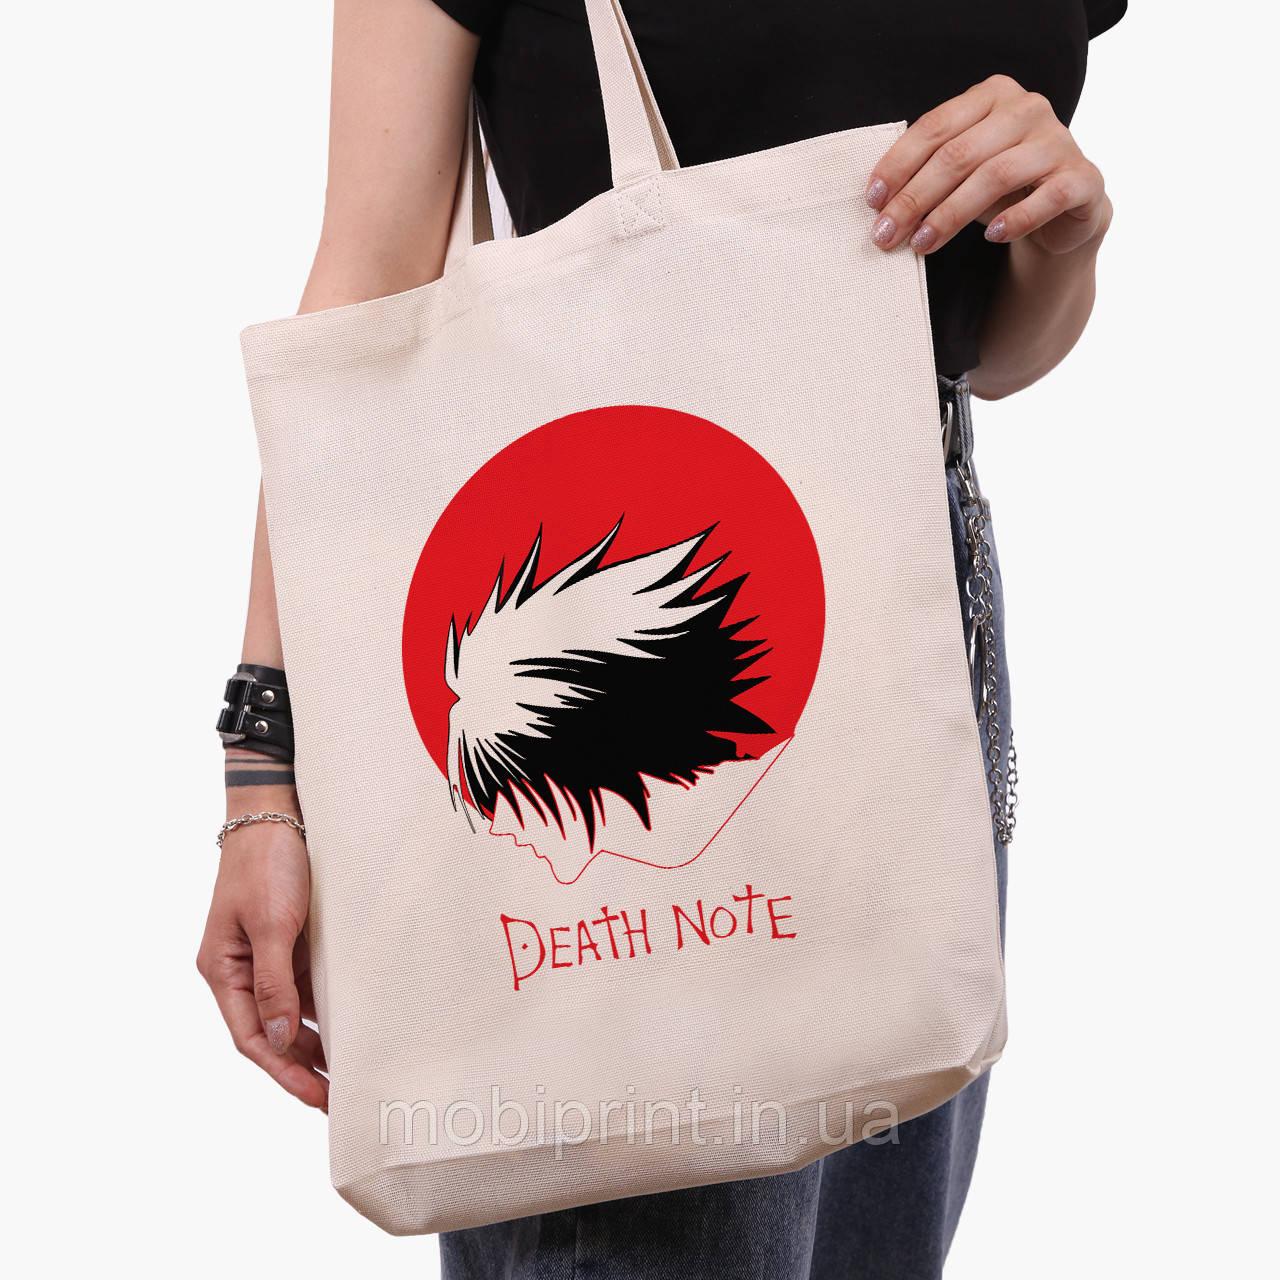 Еко сумка шоппер біла Ел Зошит смерті (Death Note) (9227-2653-1) 41*39*8 см